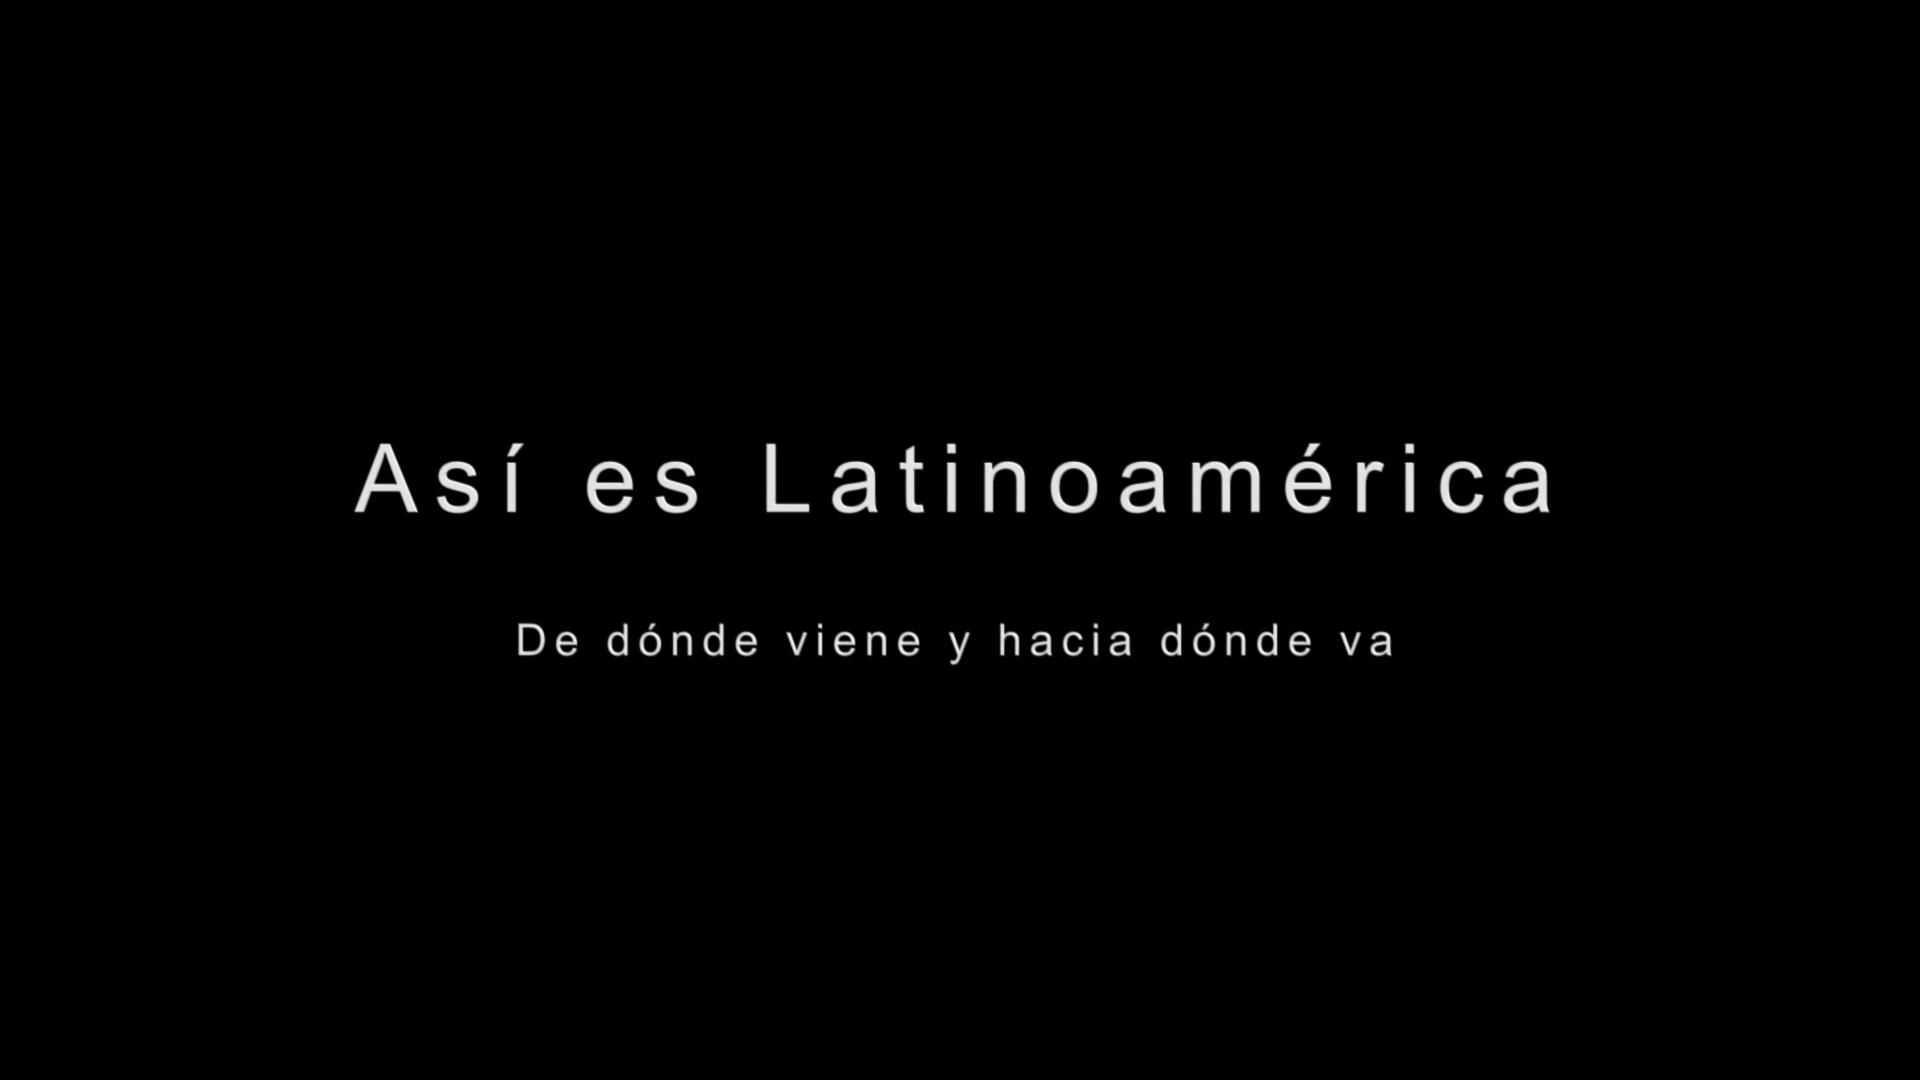 Así es Latinoamércia Ad 1